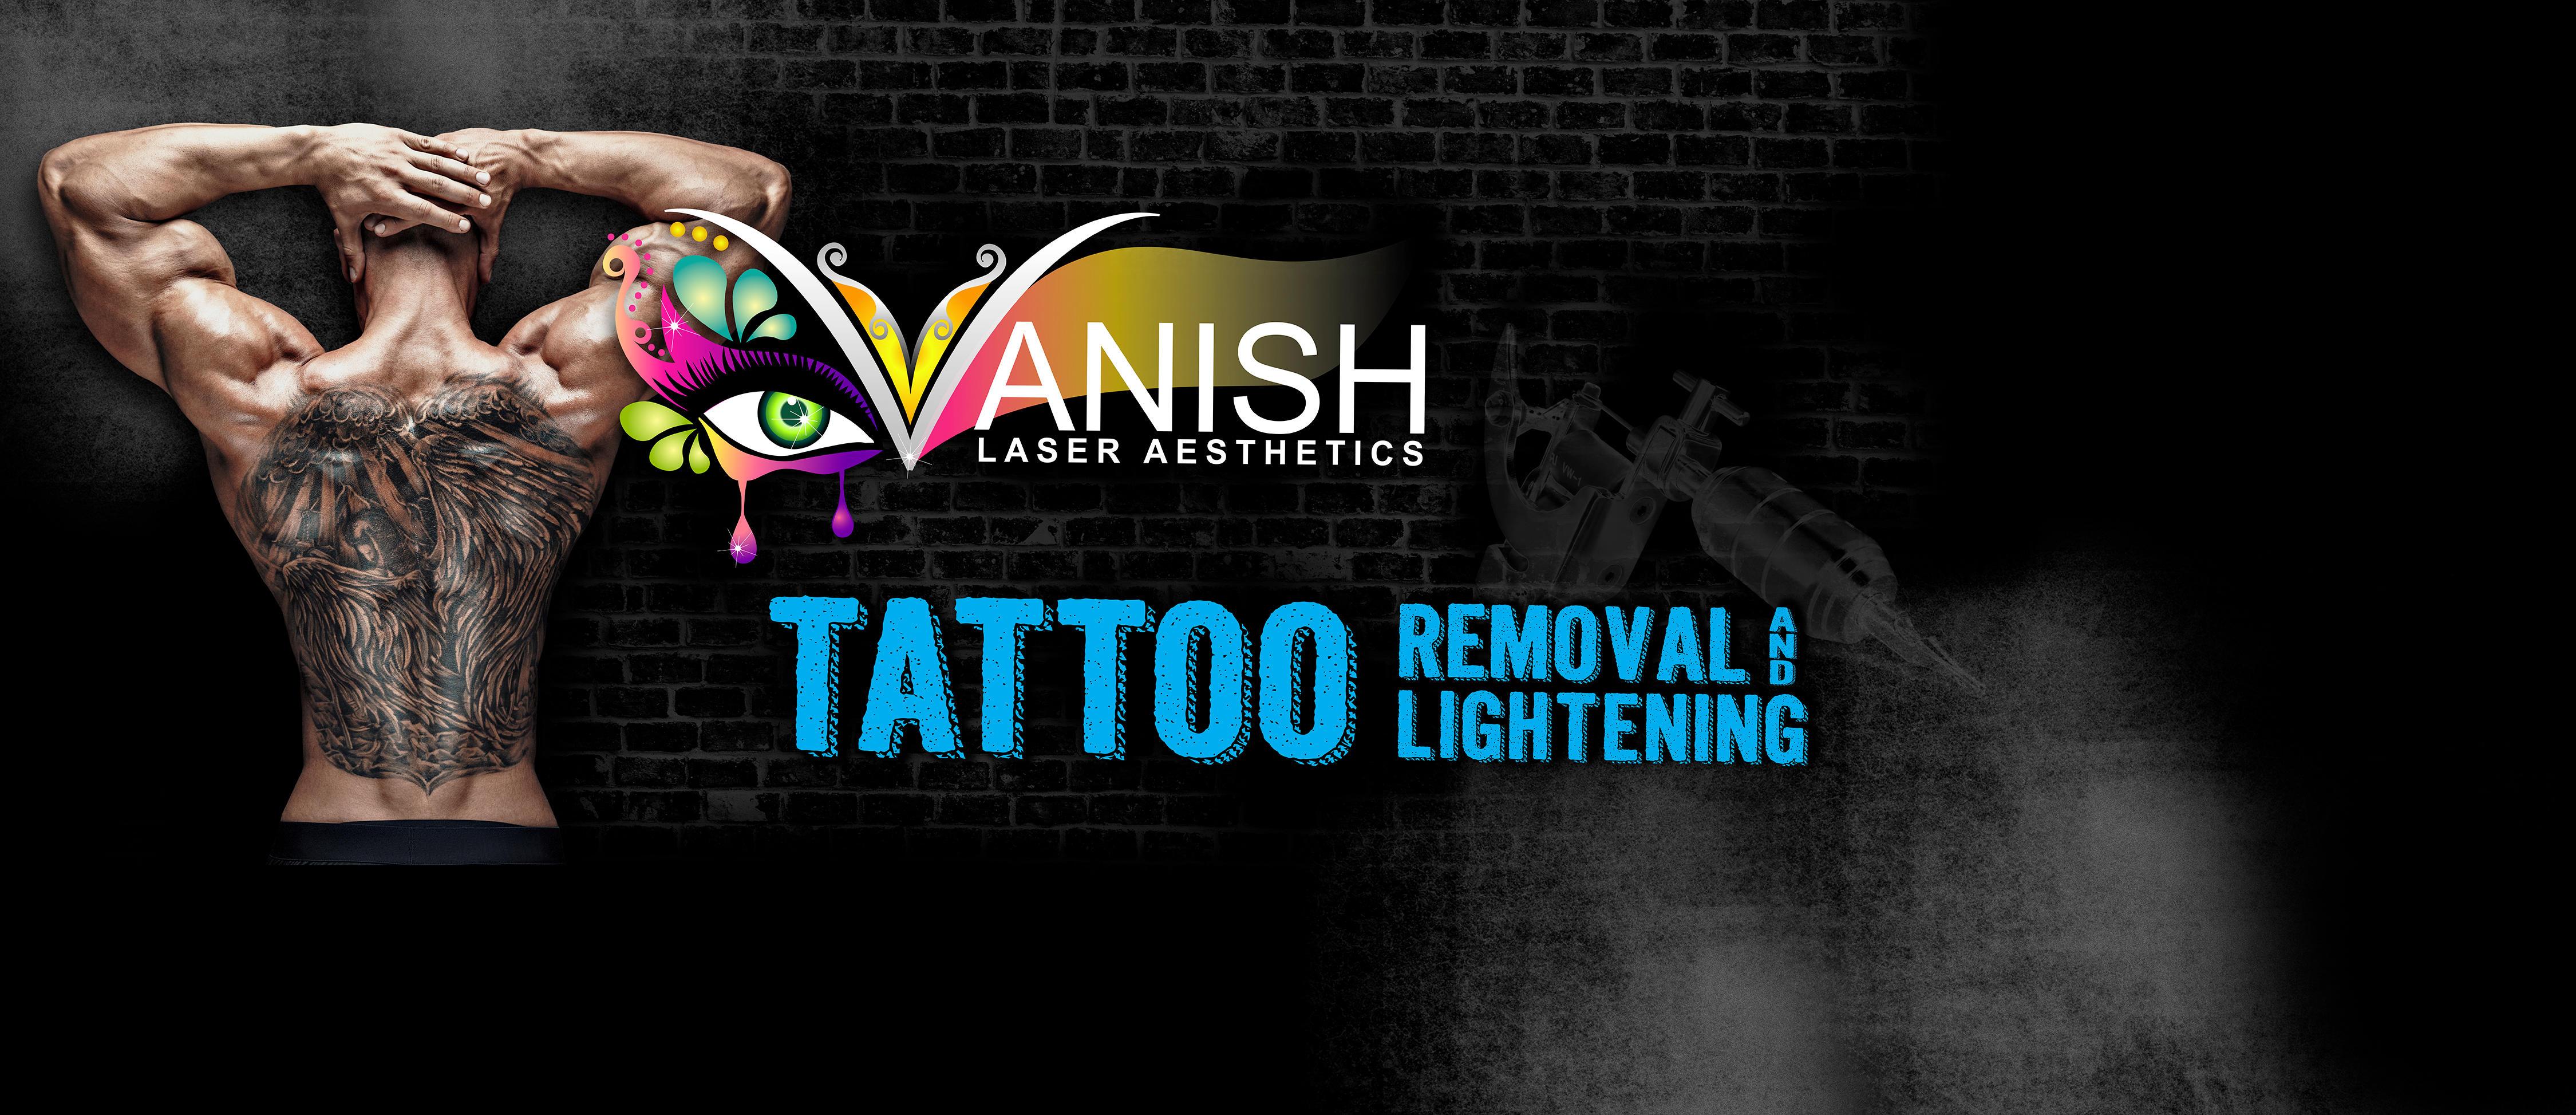 Vanish Laser Aesthetics image 22